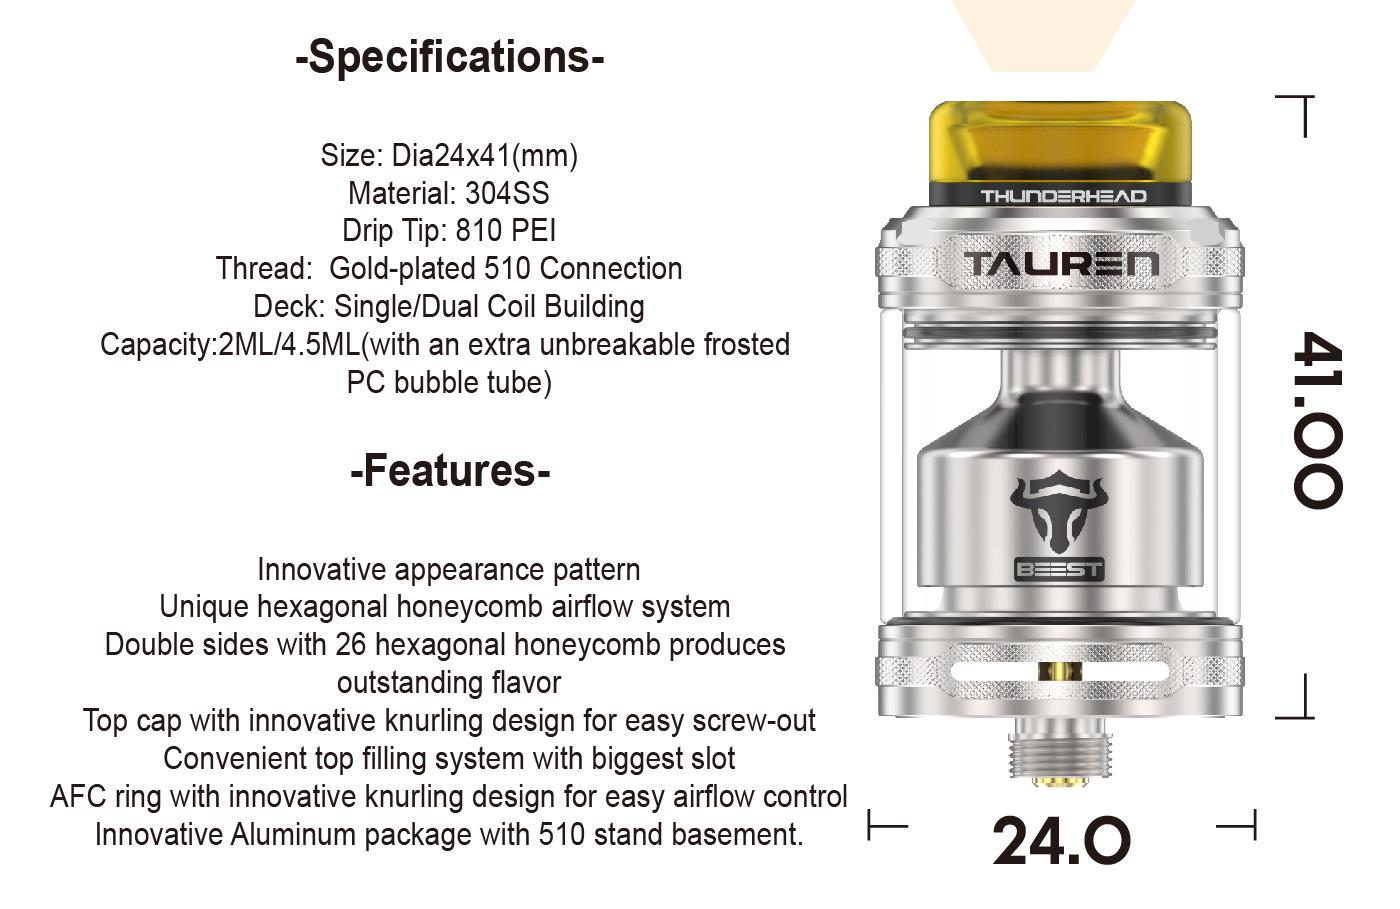 9eb2cfe3391a290fad71155a438f467c Thunder Head Creations Tauren RTA 2ml / 4.5ml Xsmokers